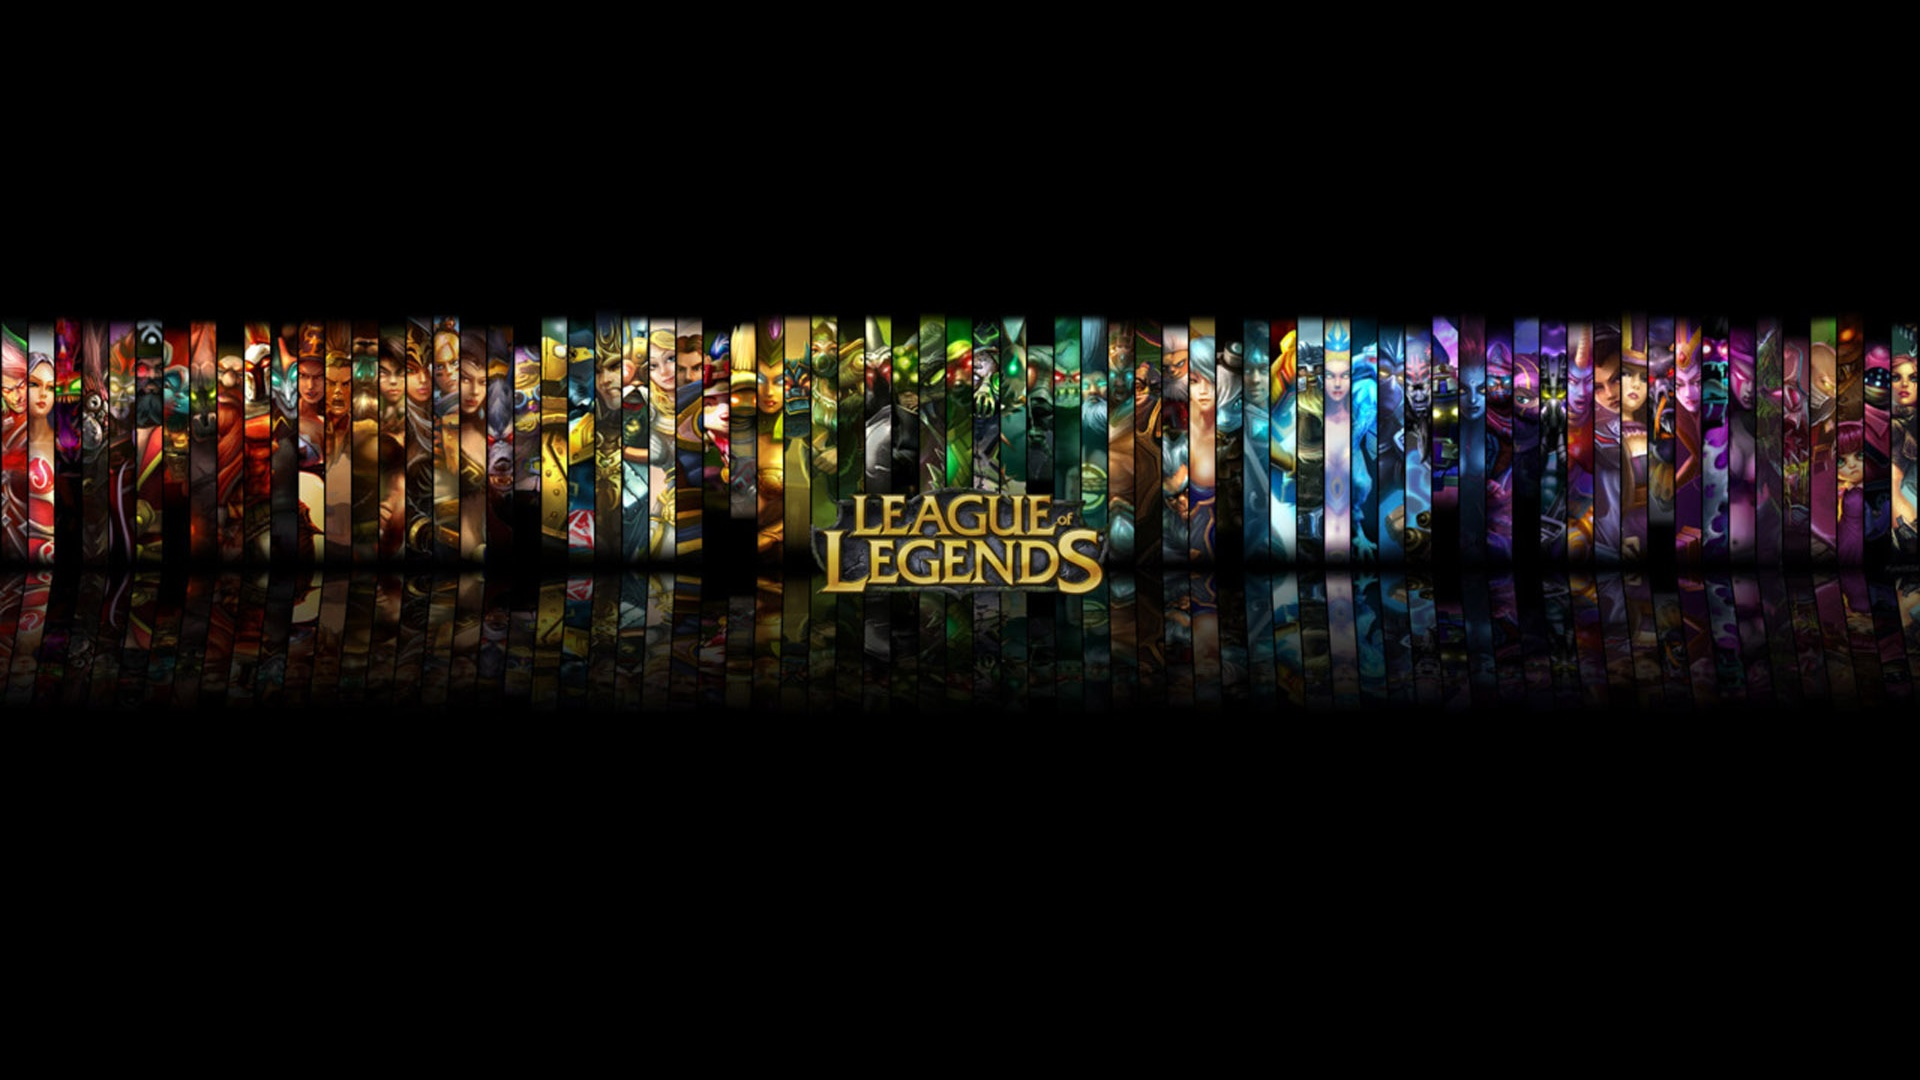 League Of Legends Wallpaper 1920×1080 – Dota 2 and E-Sports Geeks